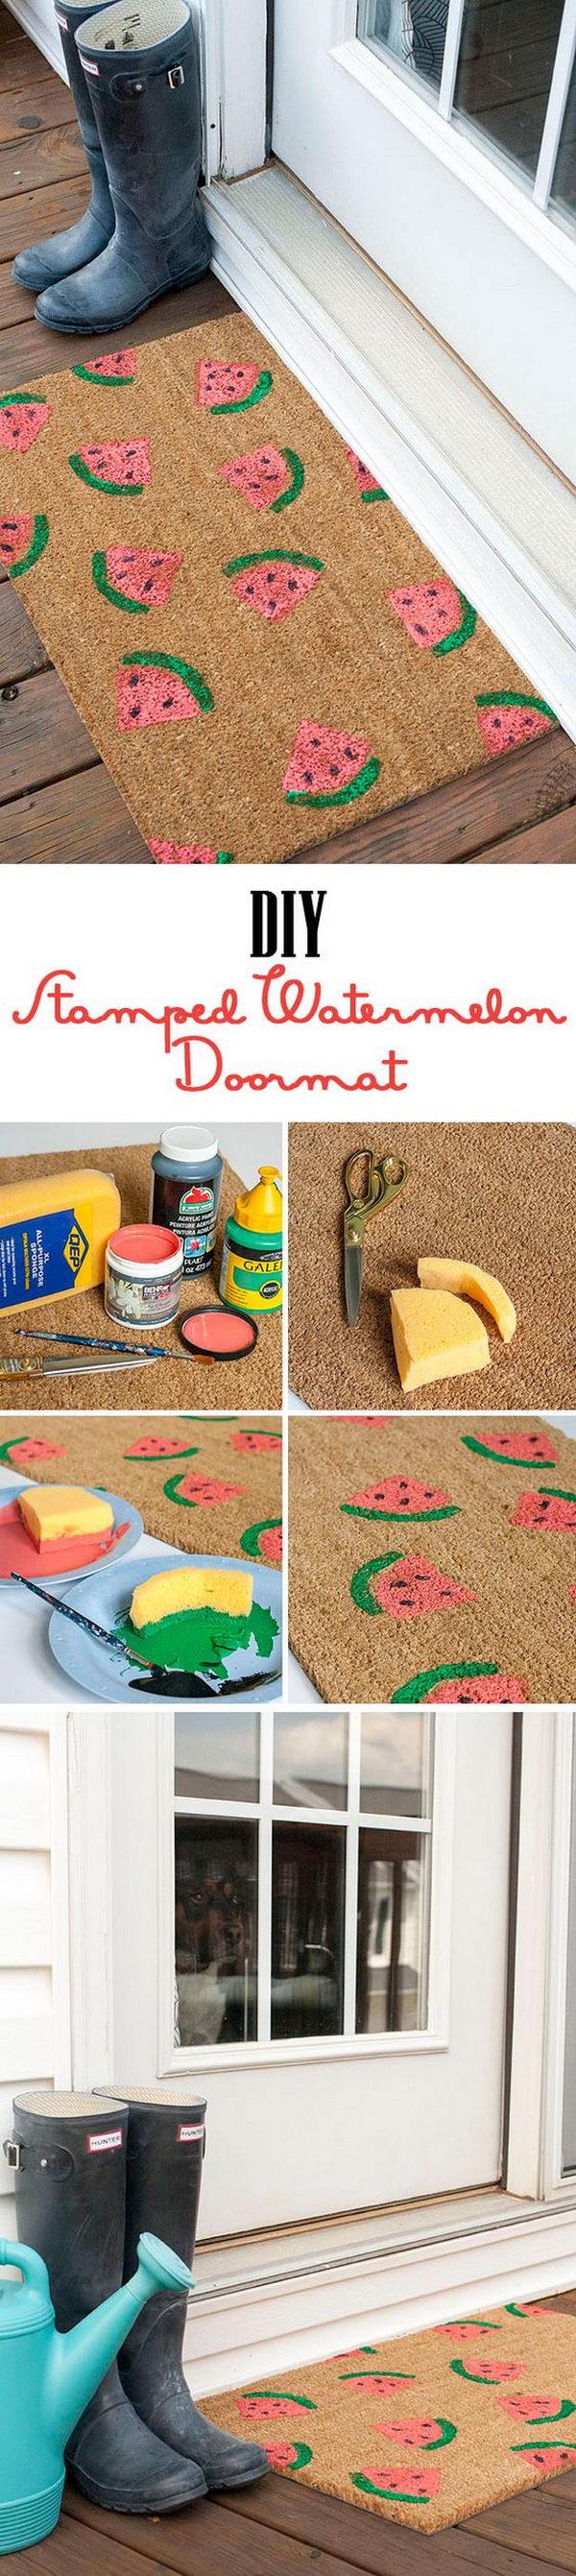 DIY Stamped Watermelon Doormat.